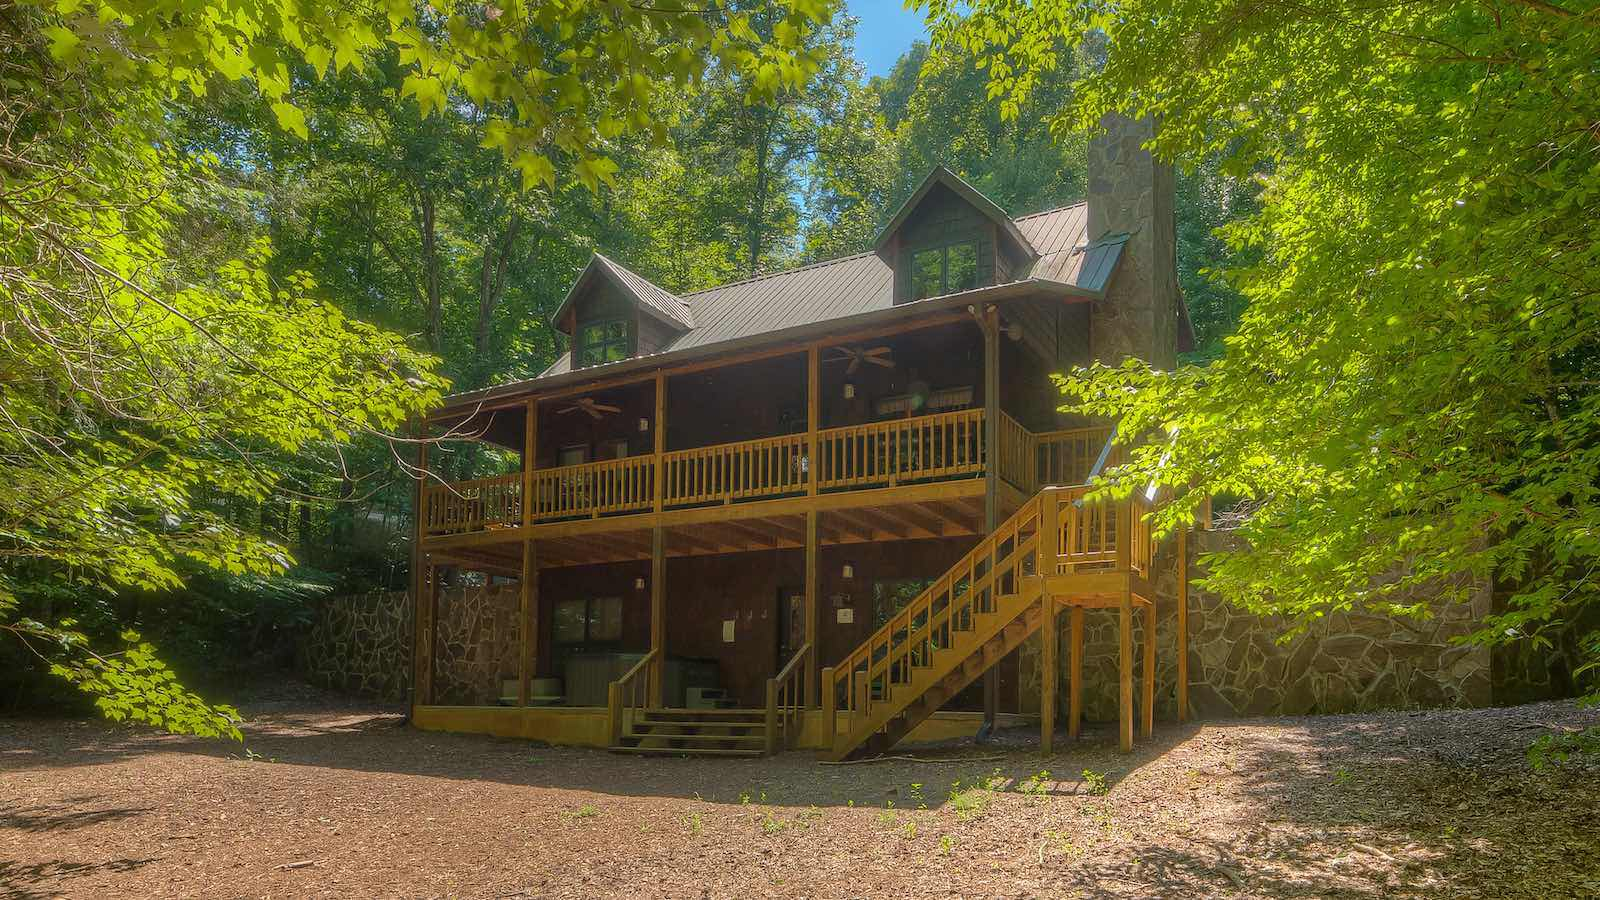 Creekside Hideaway Cabin Rental